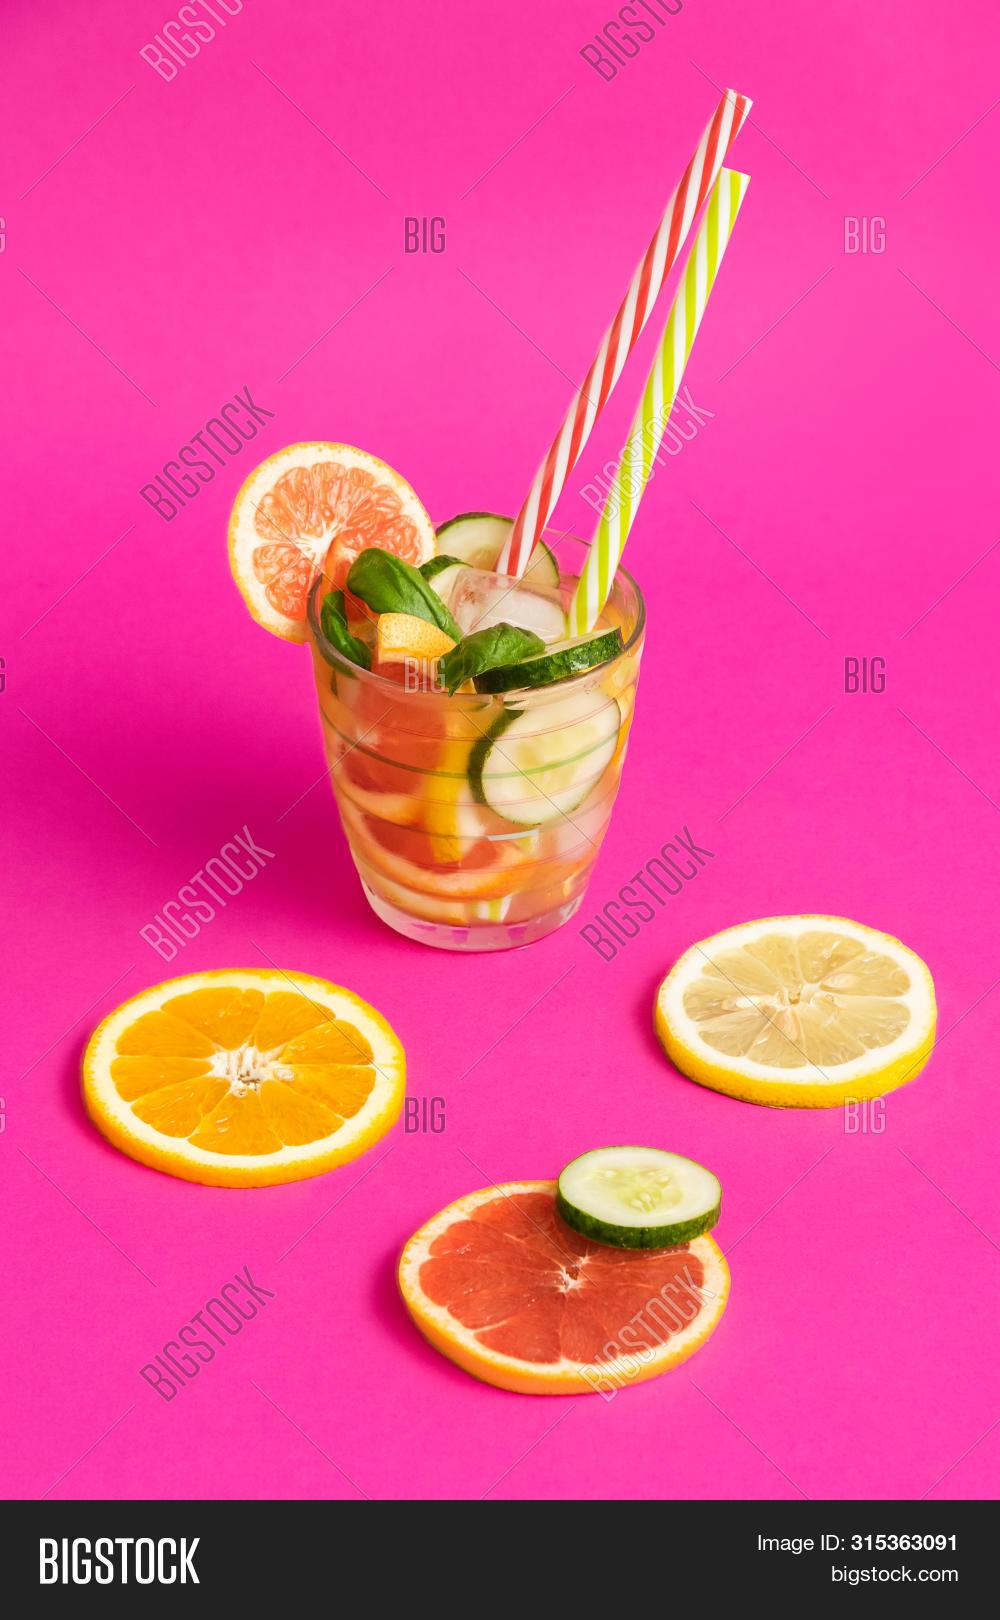 background,balance,citrus,citruses,closeup,cocktail,color,colorful,copy,creative,cucumber,detox,detoxification,diet,drink,fancy,flat,food,freshness,fruit,fuchsia,glass,grapefruit,healthy,homemade,ideas,juicy,lay,lemon,lifestyles,macro,orange,organic,photography,preparation,raw,refreshing,seasonal,serving,slice,space,straw,studio,tasty,vegan,vegetarian,vibrant,vitamins,water,yellow